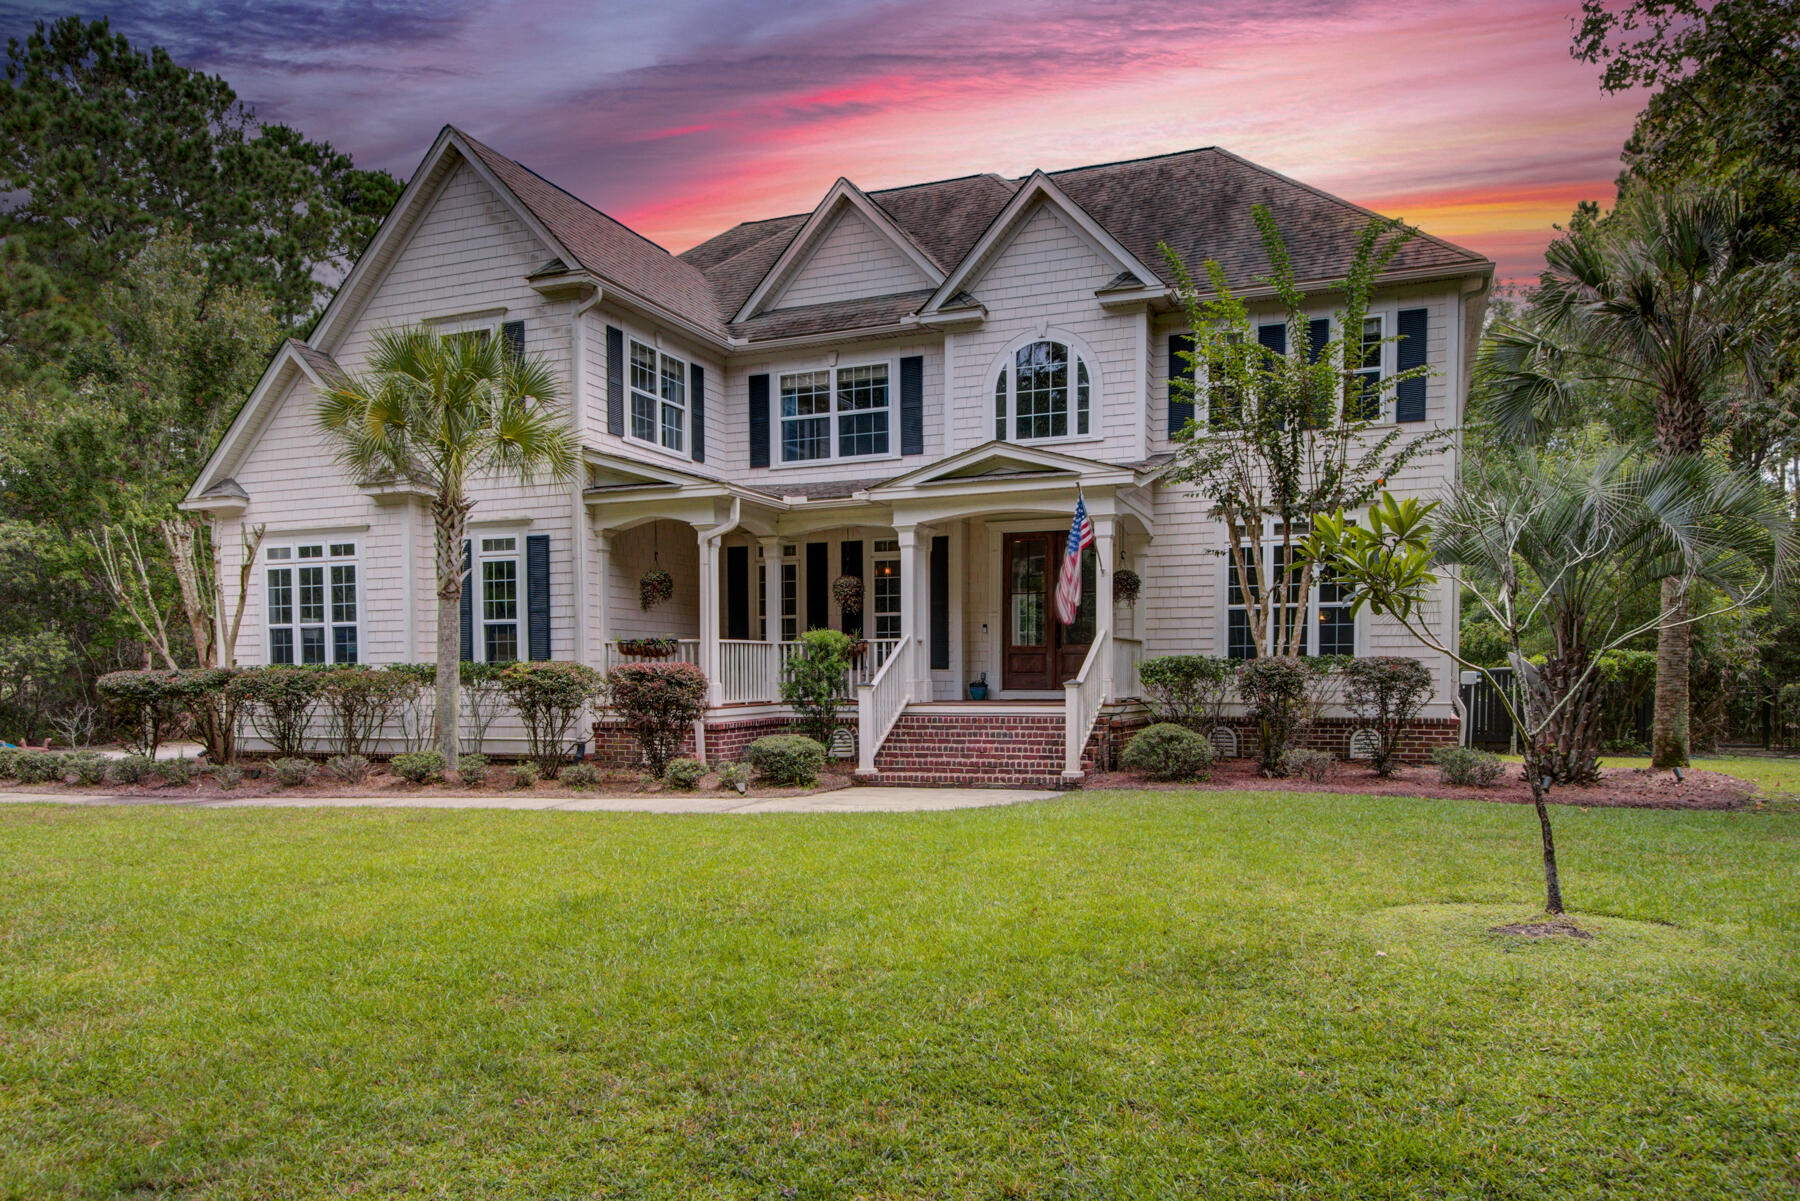 Dunes West Homes For Sale - 3095 Pignatelli, Mount Pleasant, SC - 46